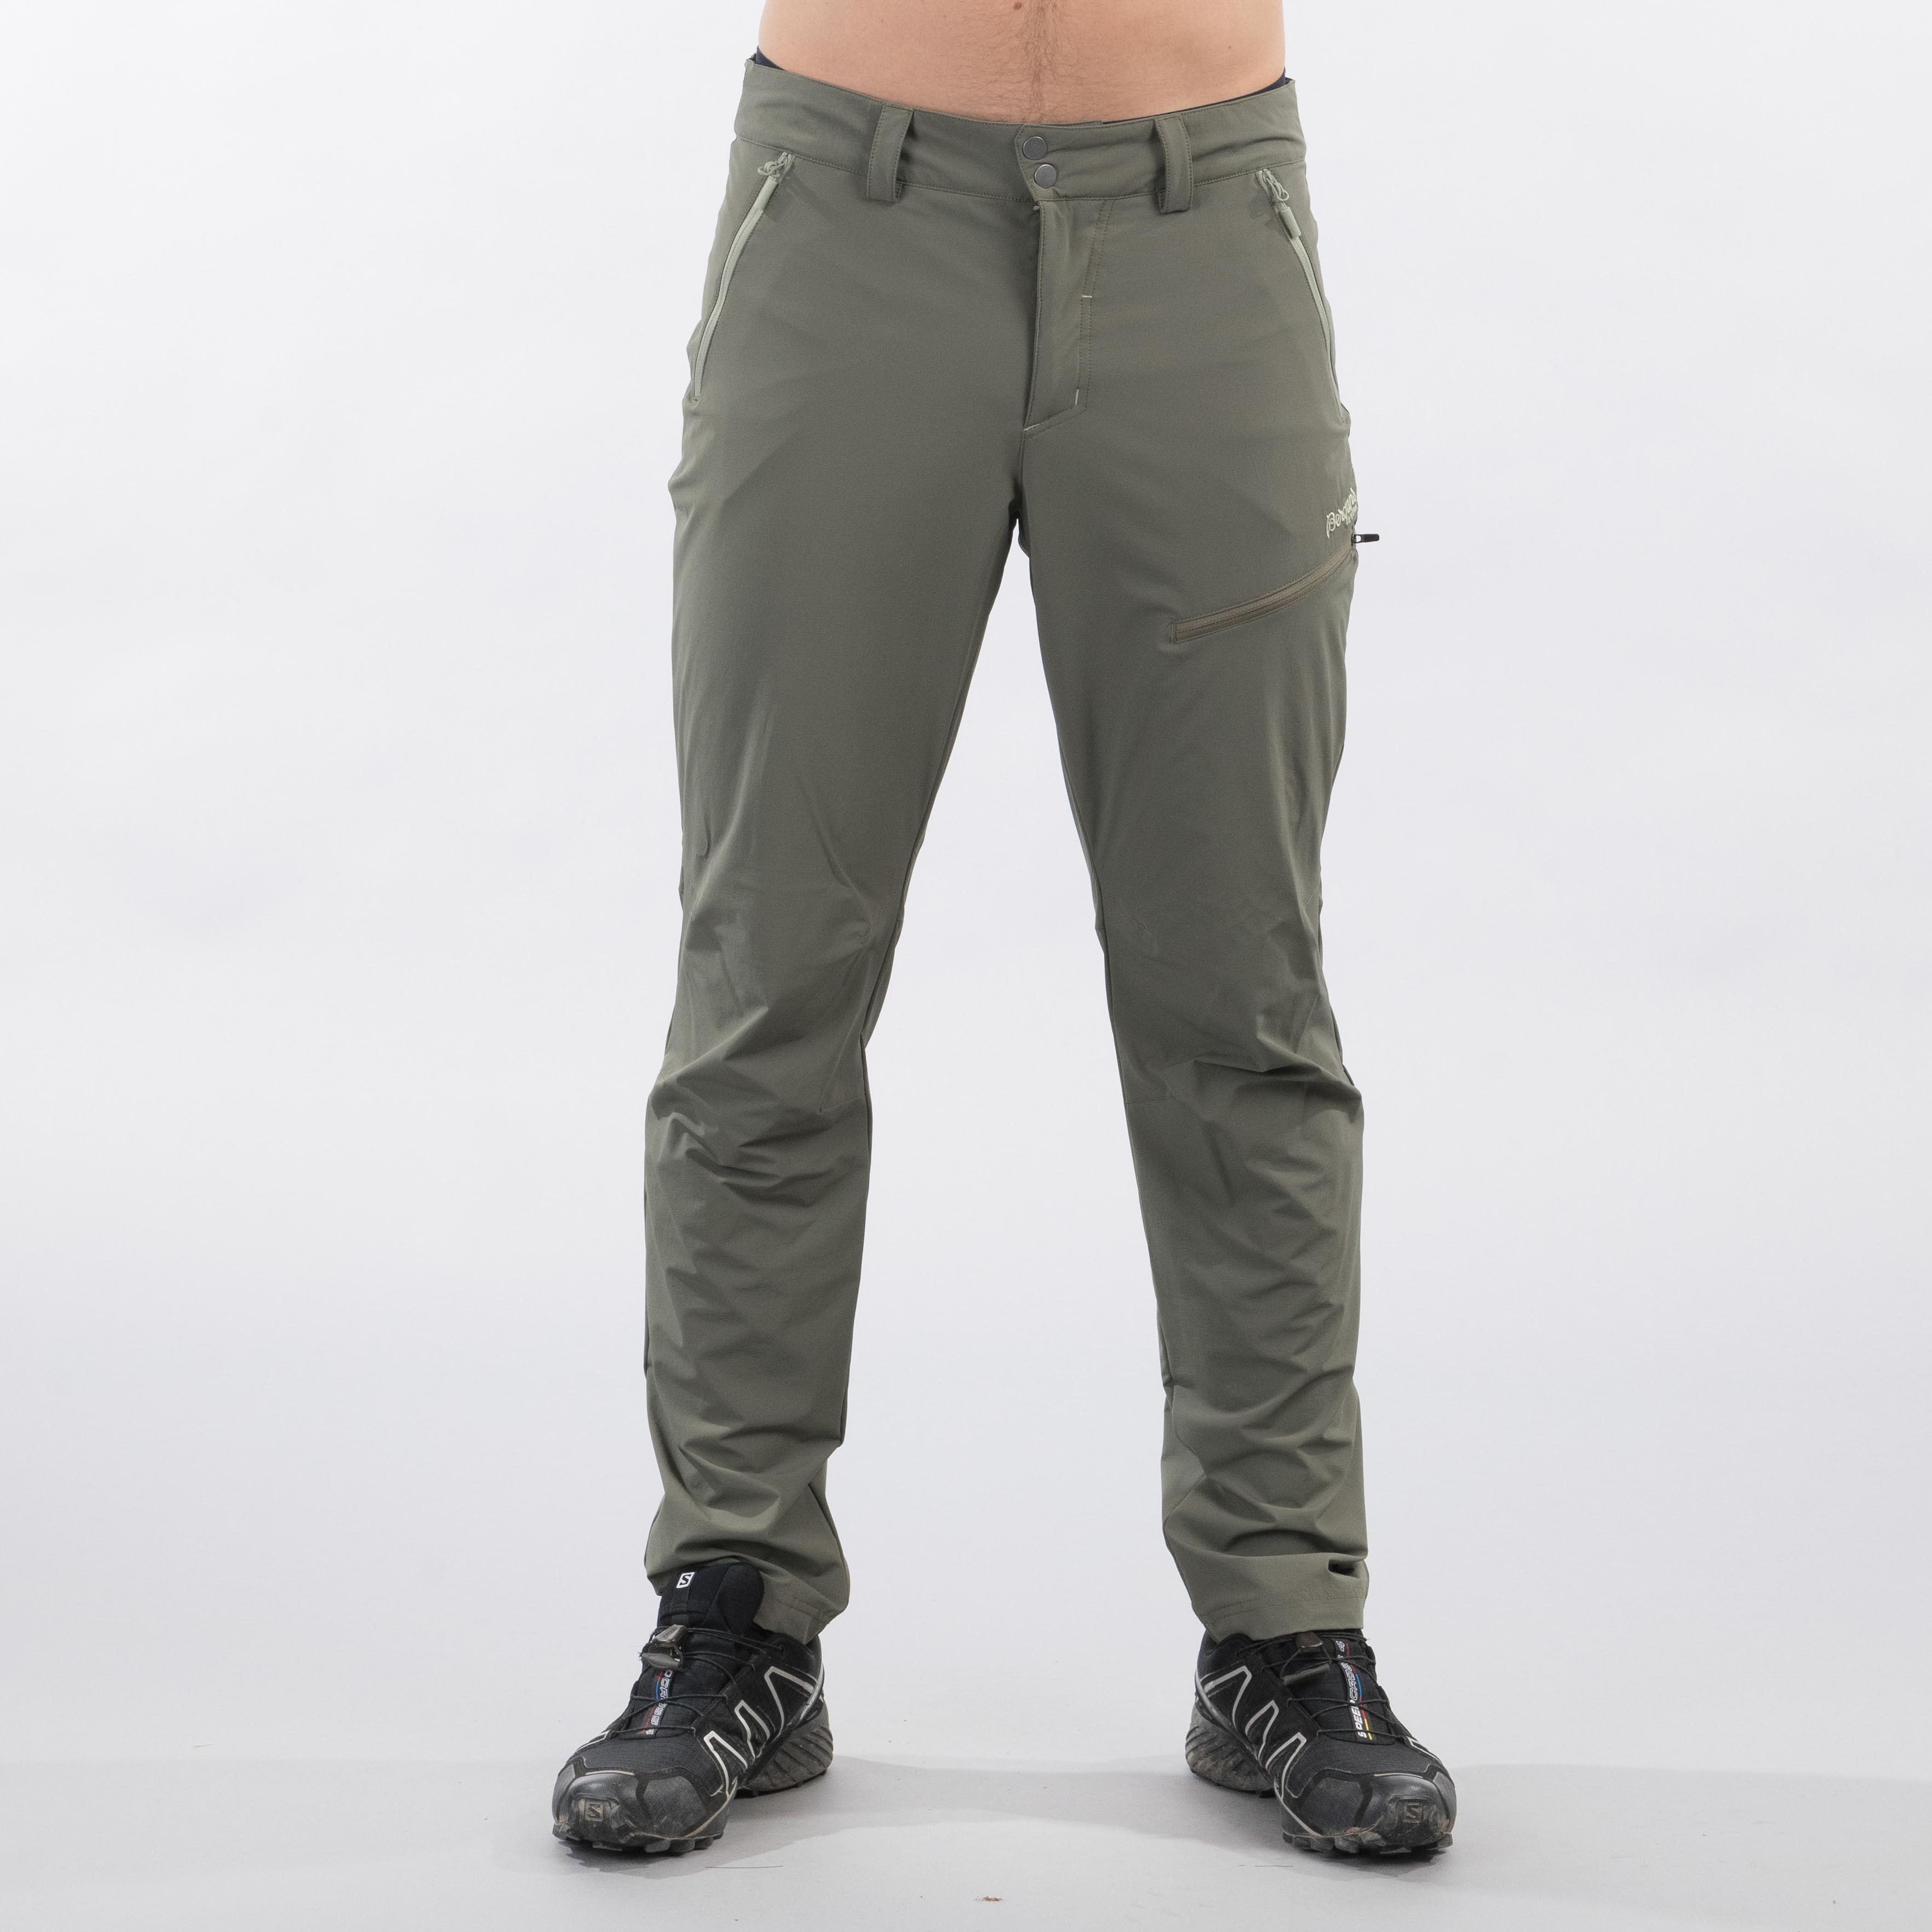 Tyin Pants